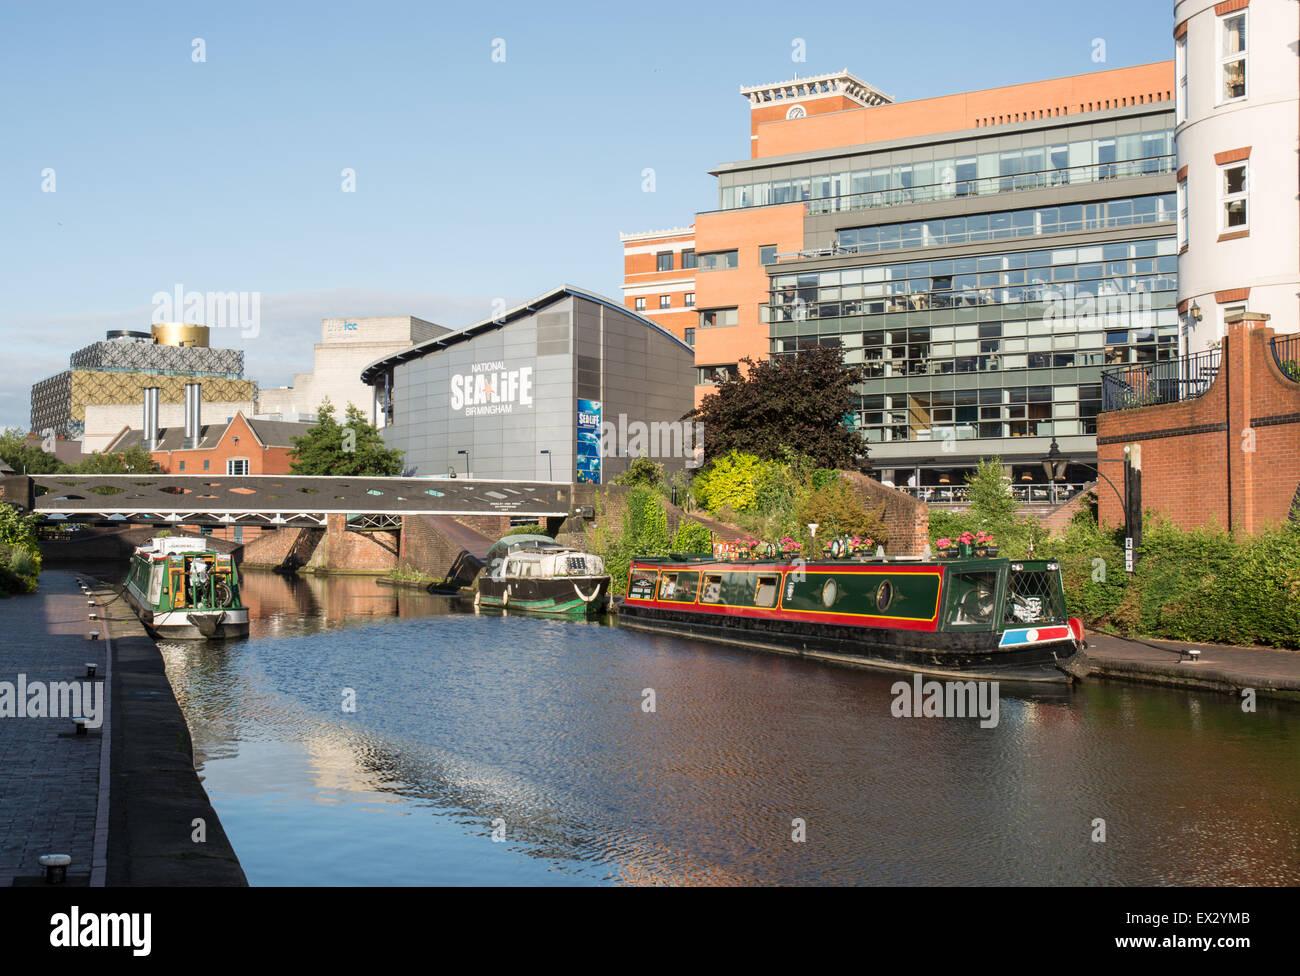 Birmingham Canal, with National Sea-Life Birmingham, in Birmingham city centre - Stock Image